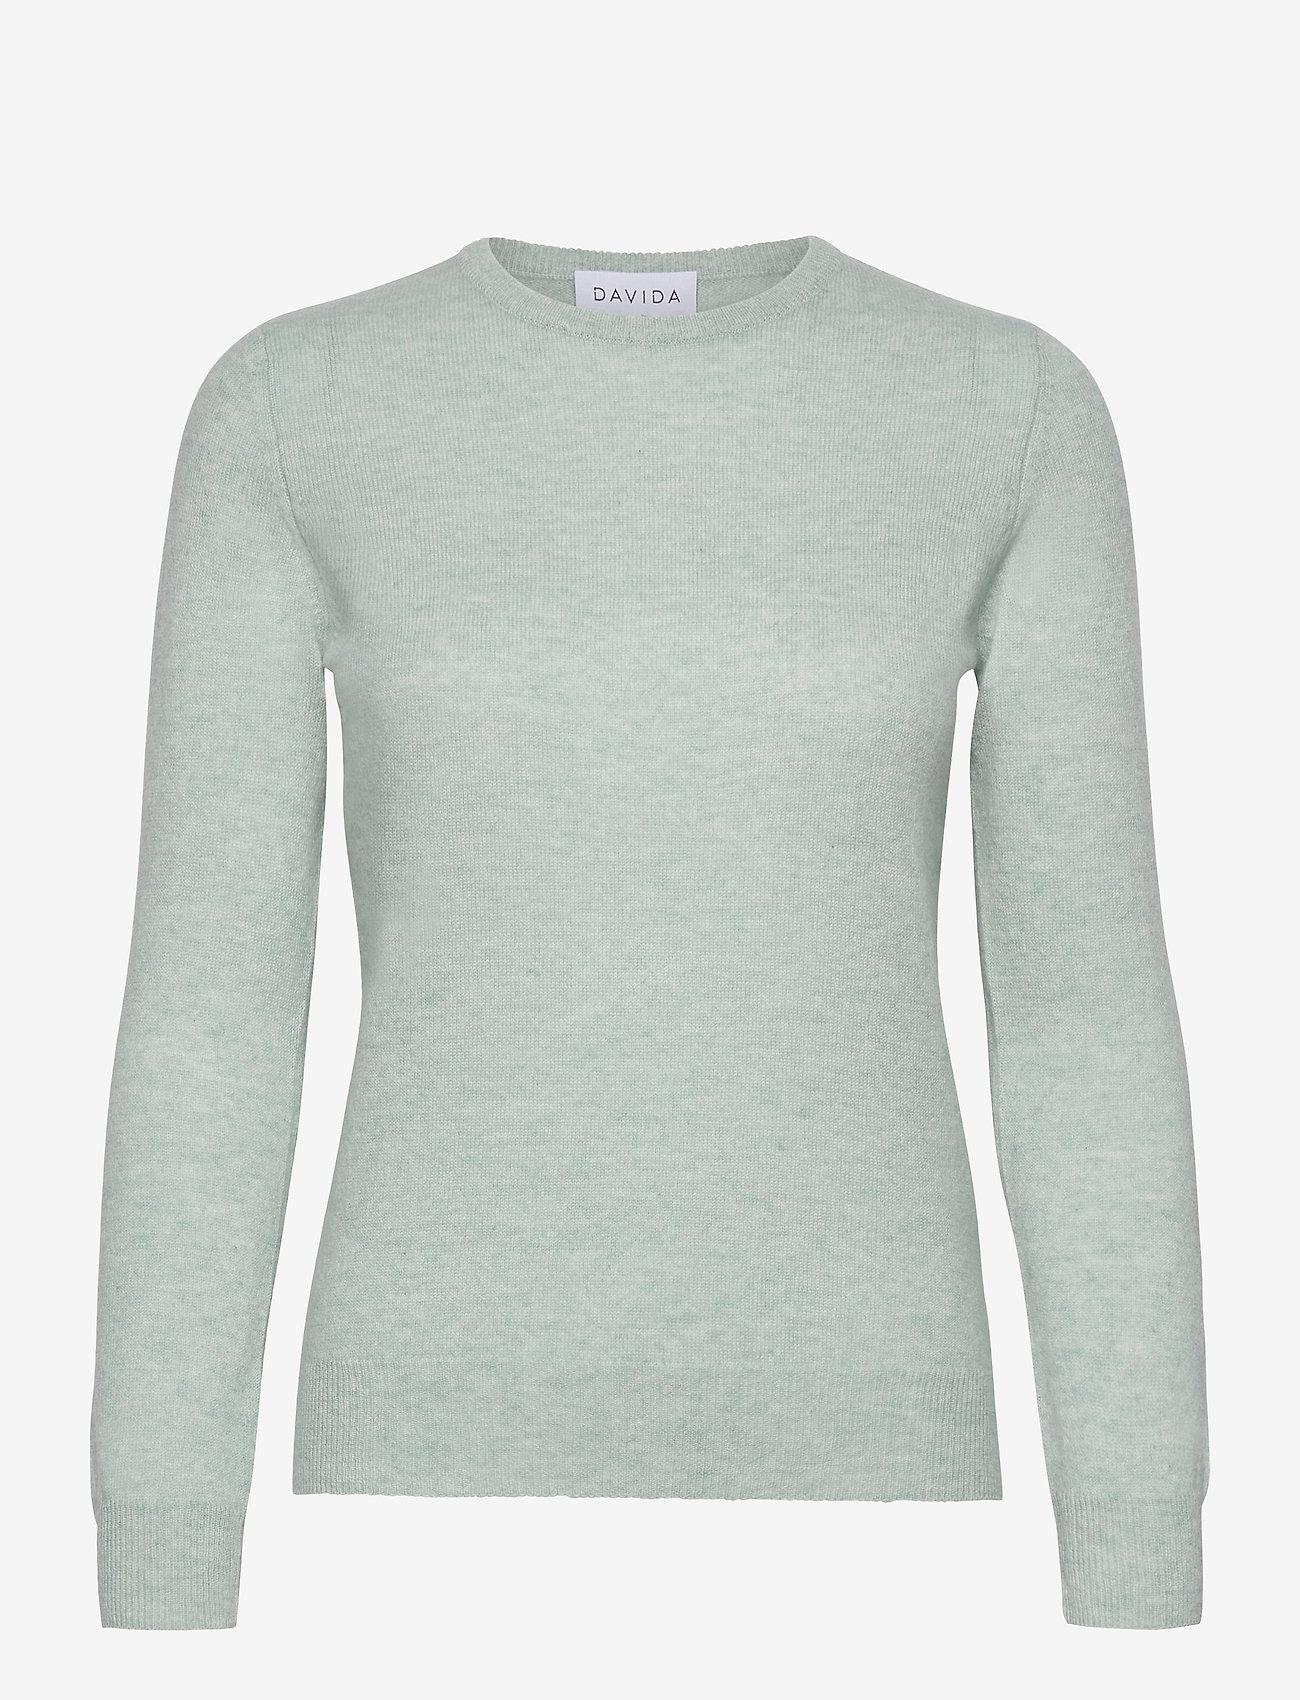 Davida Cashmere - Basic sweater - jumpers - light green - 0